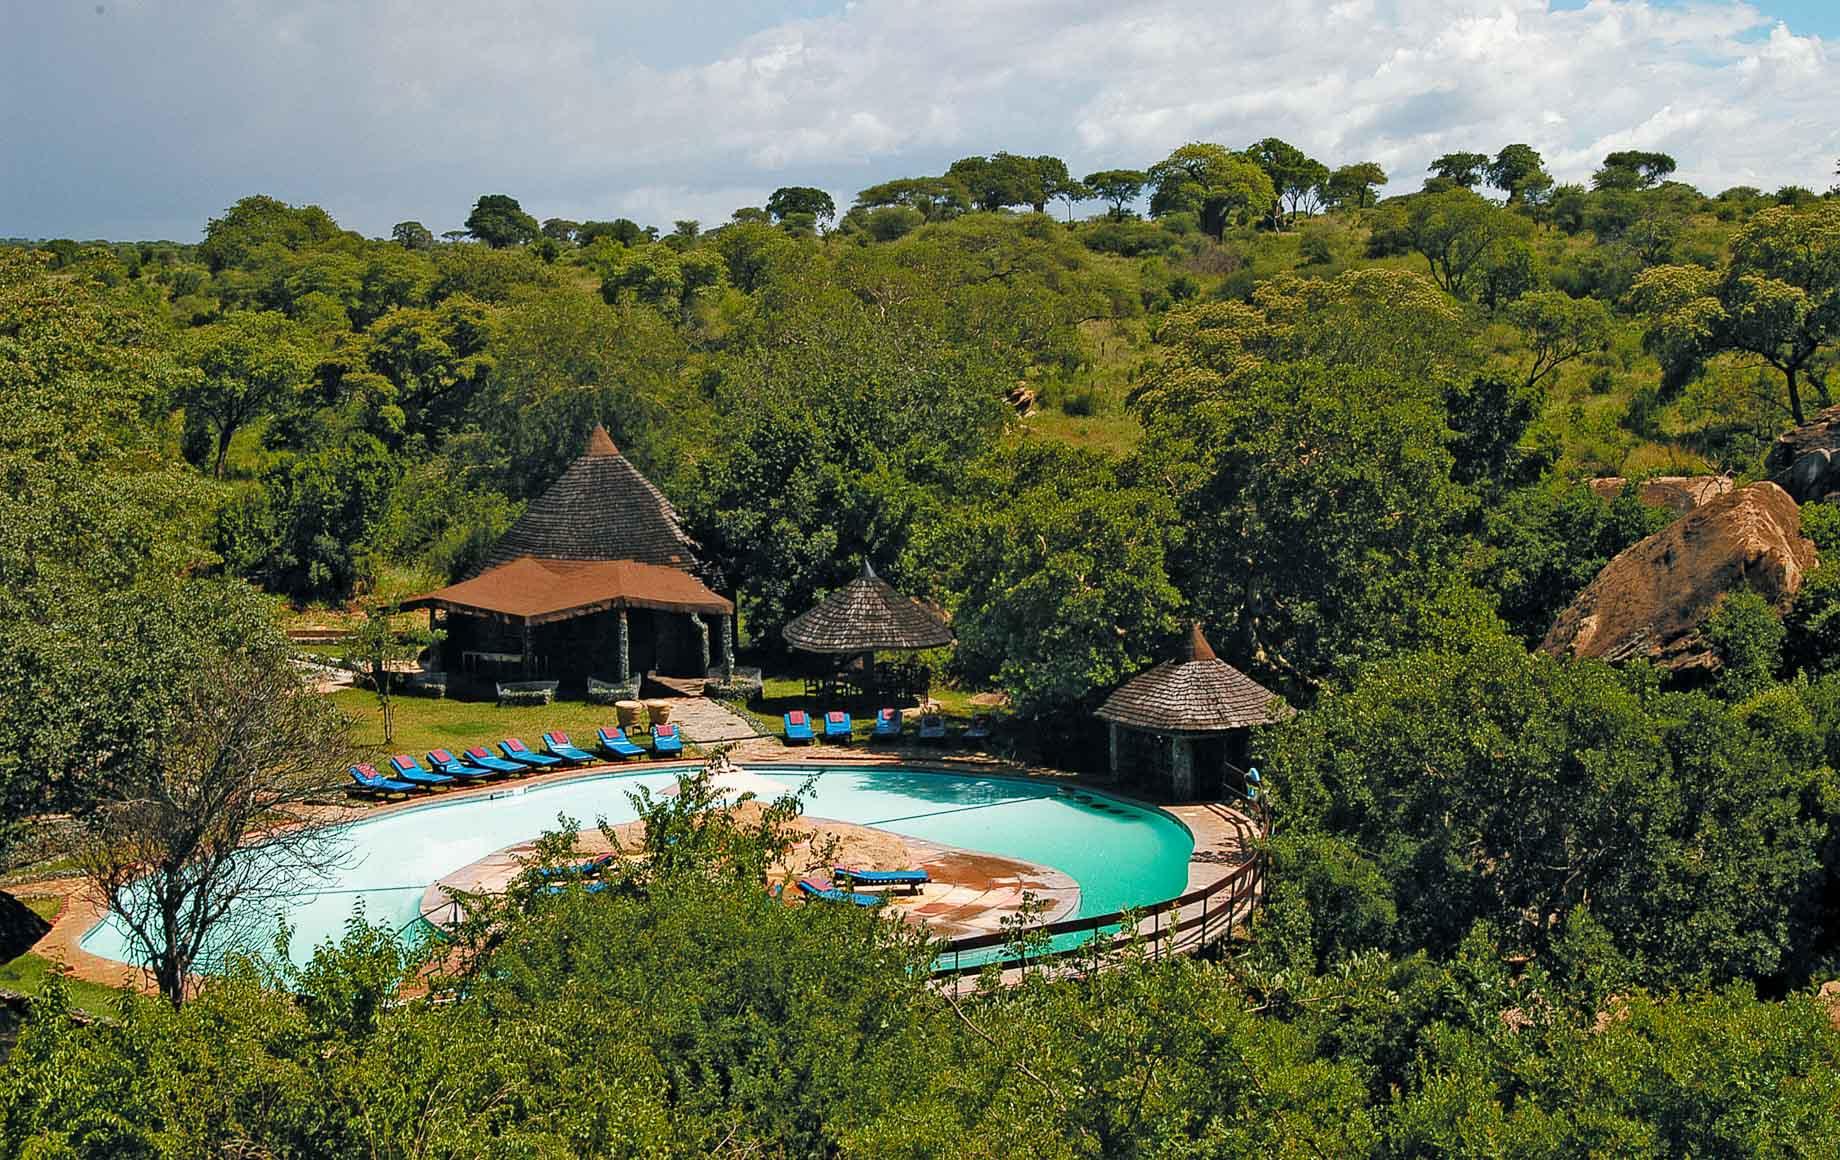 Tarangire Sopa Lodge is located in Tarangire National Park hidden amongst the Kopjes.